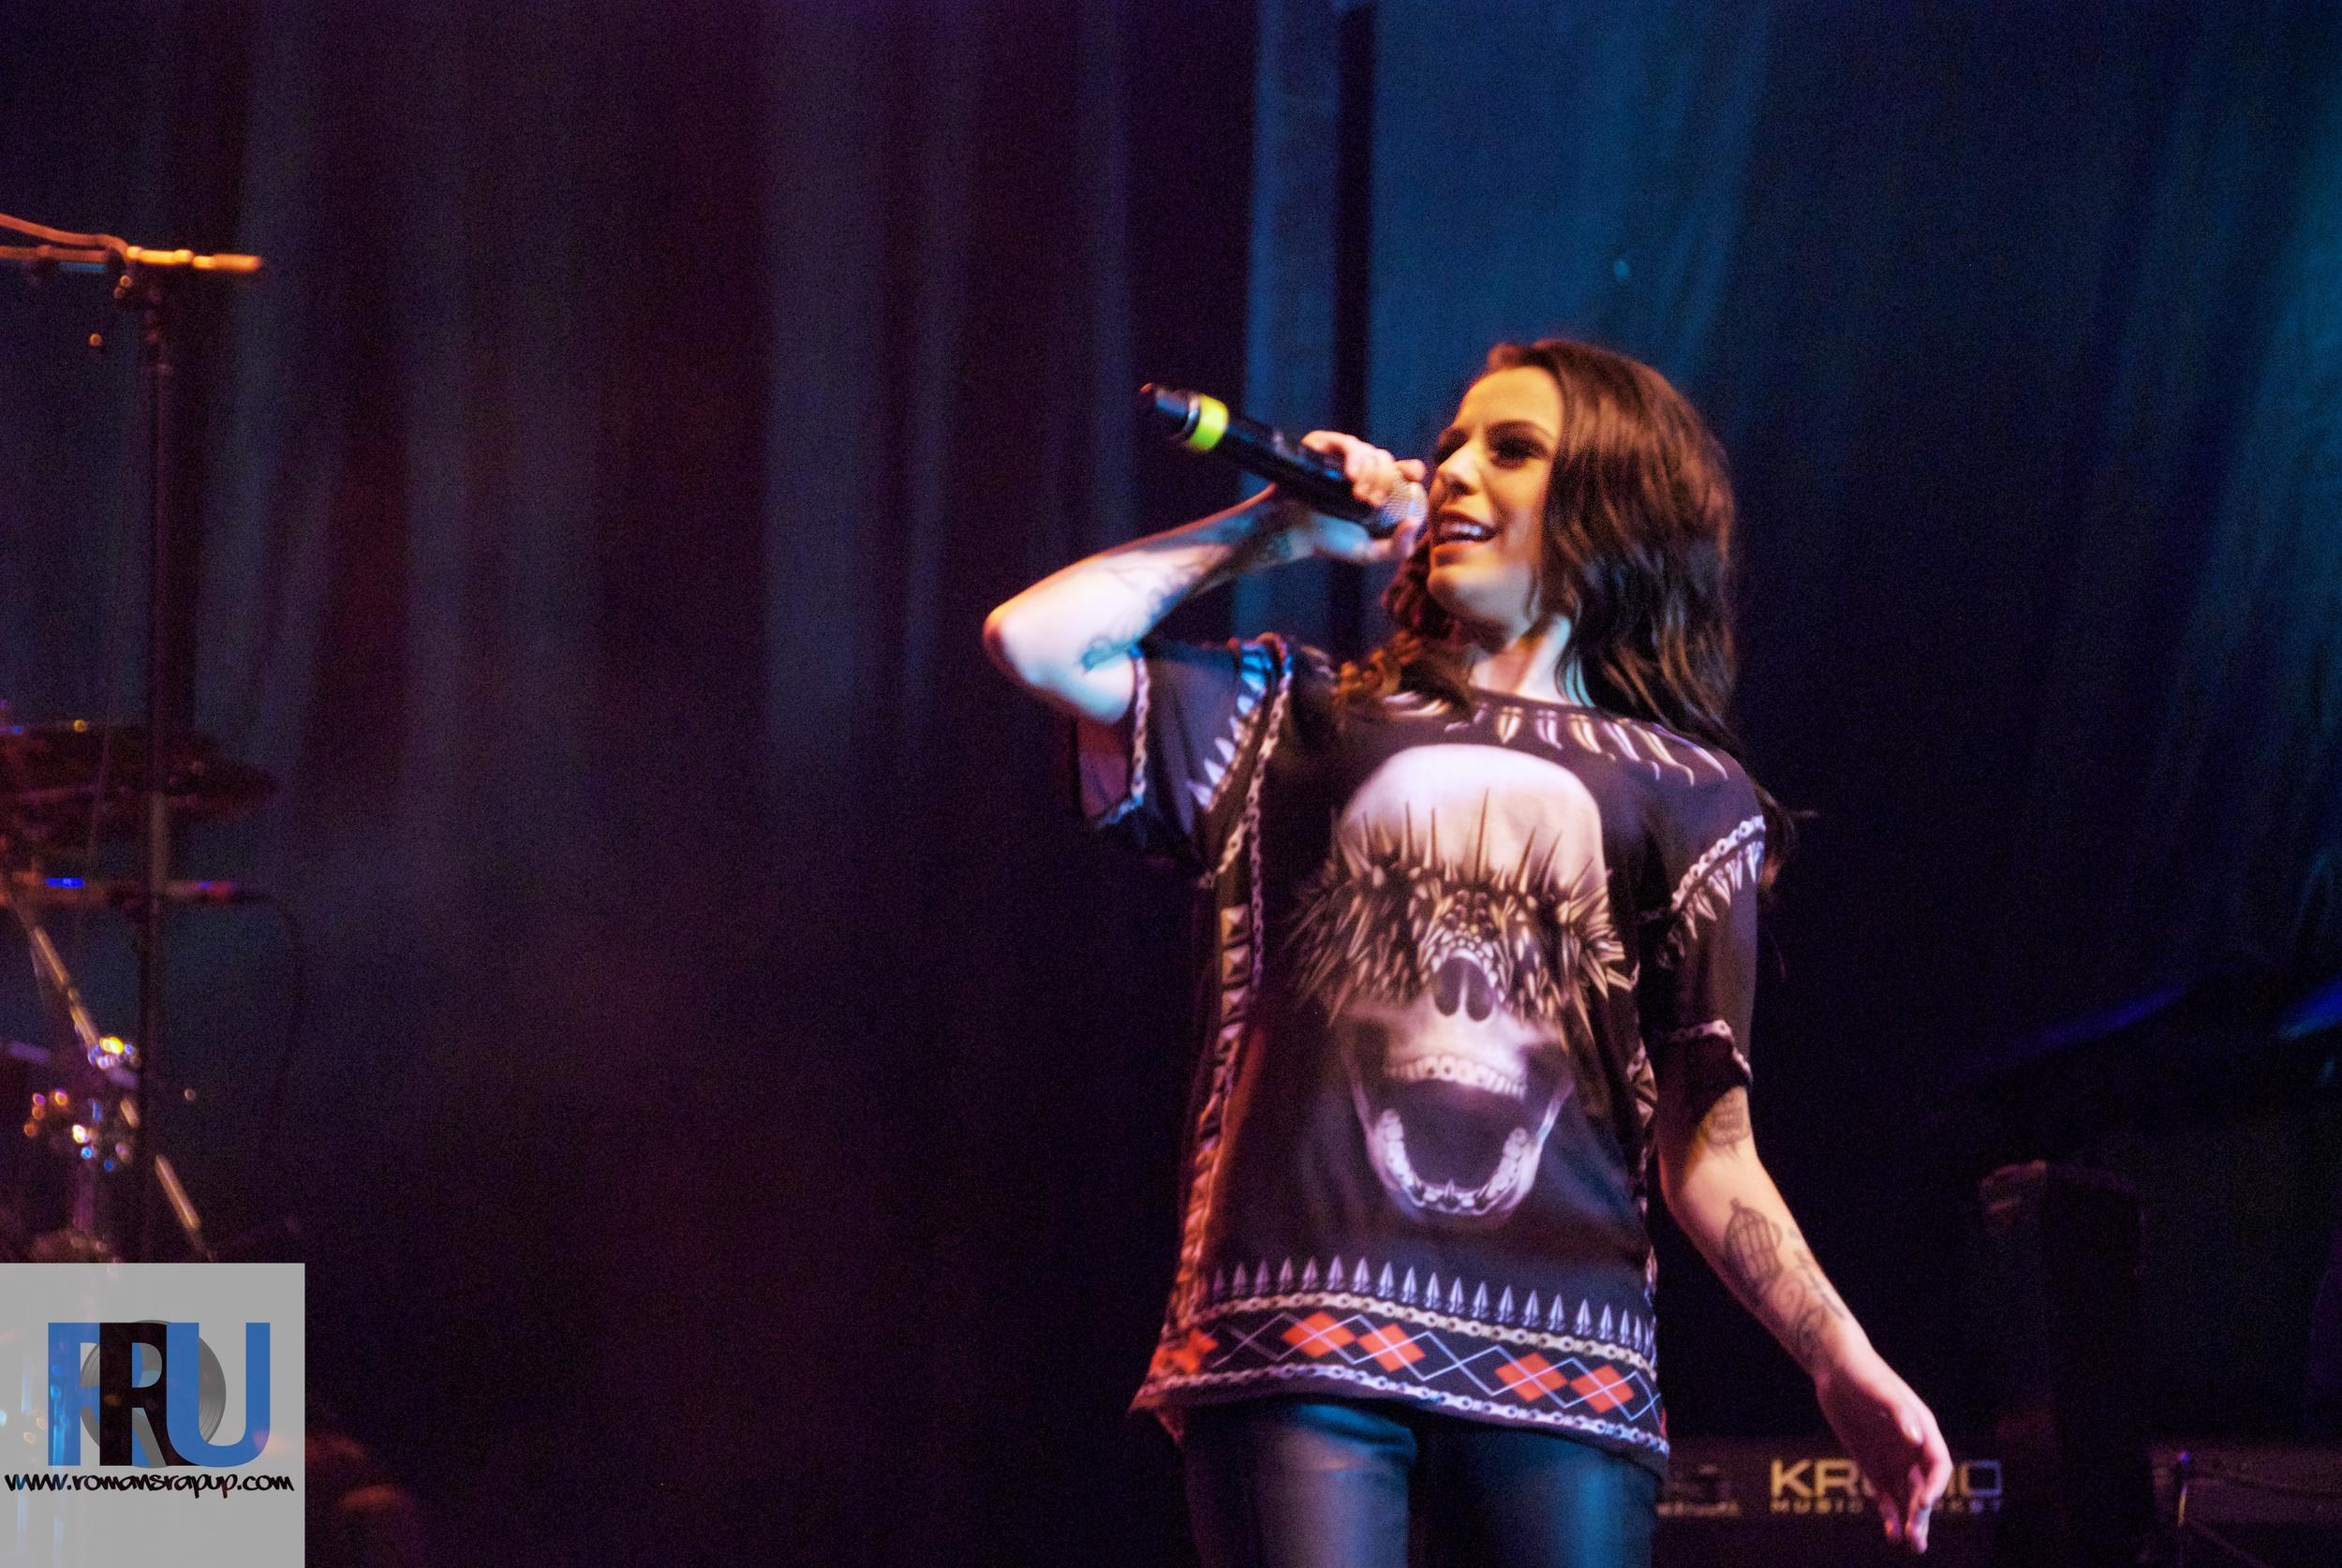 Cher Lloyd Topsfield Fair 10-12-13 23.jpg